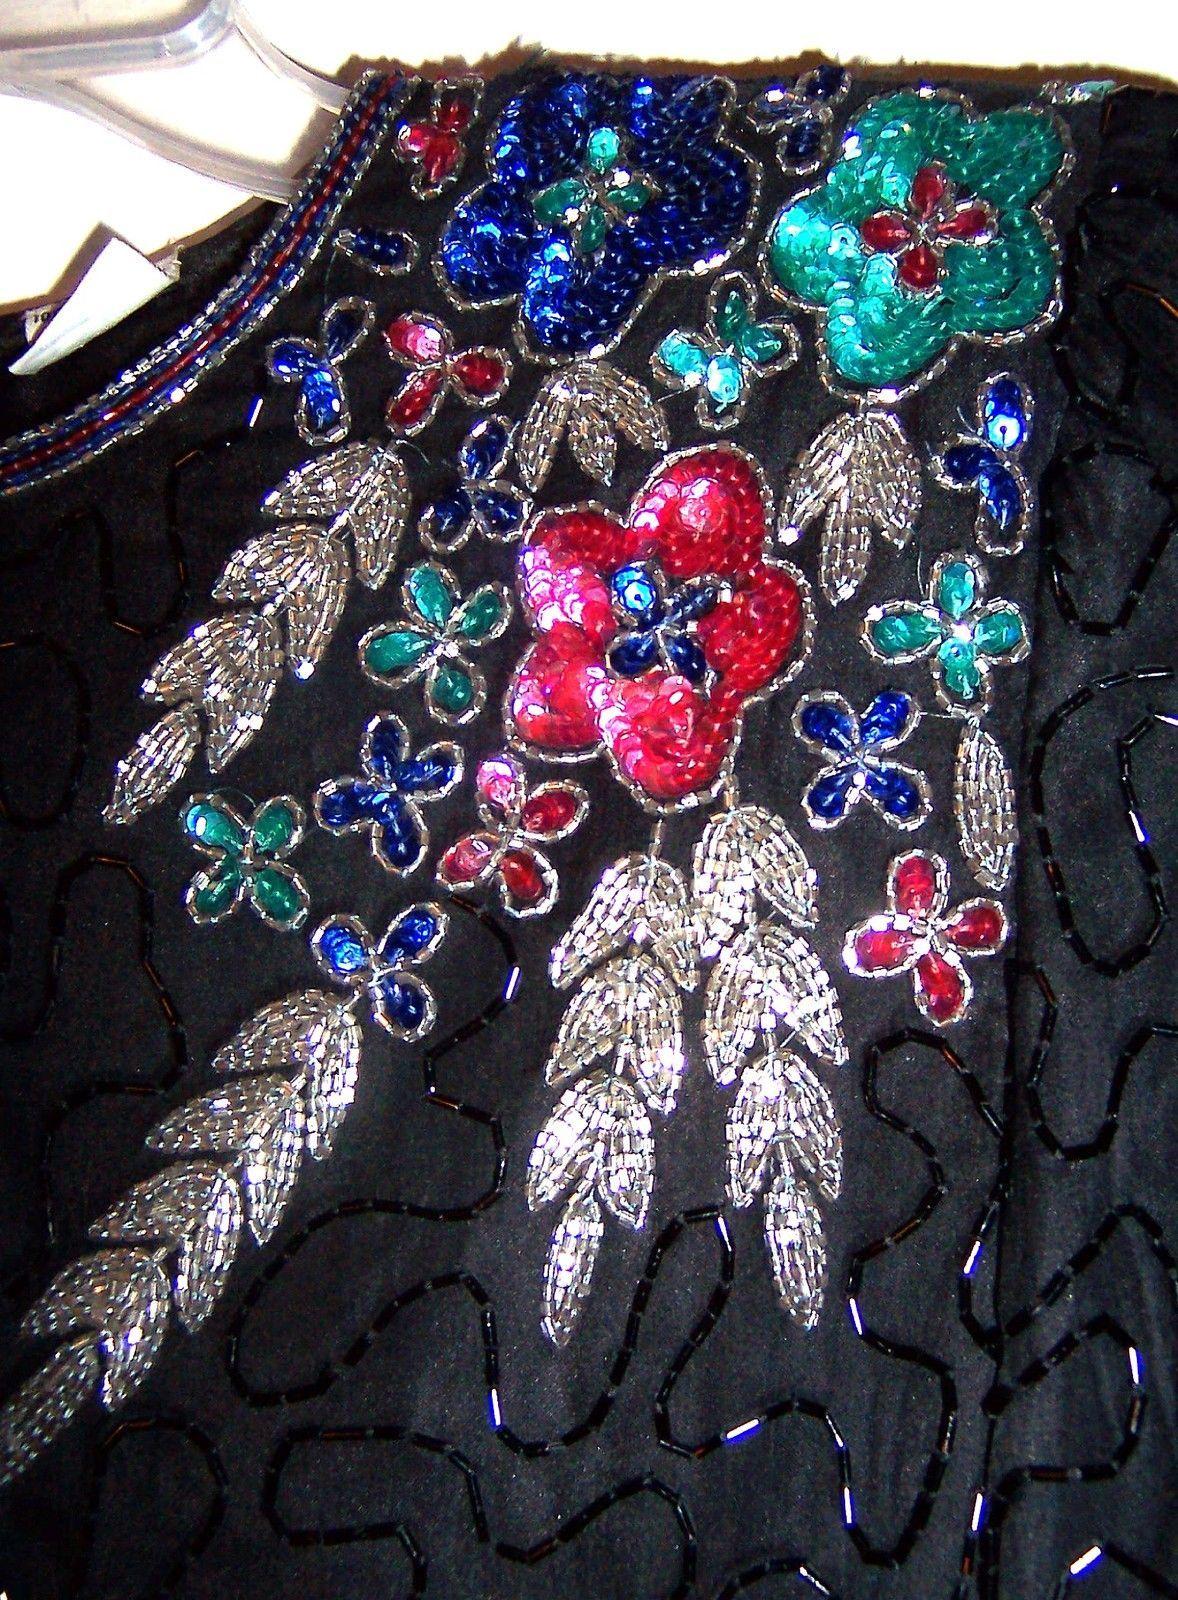 Sz M ~ Laurence Kazar Black Beaded Top w/Colorful Beaded Floral Shoulders